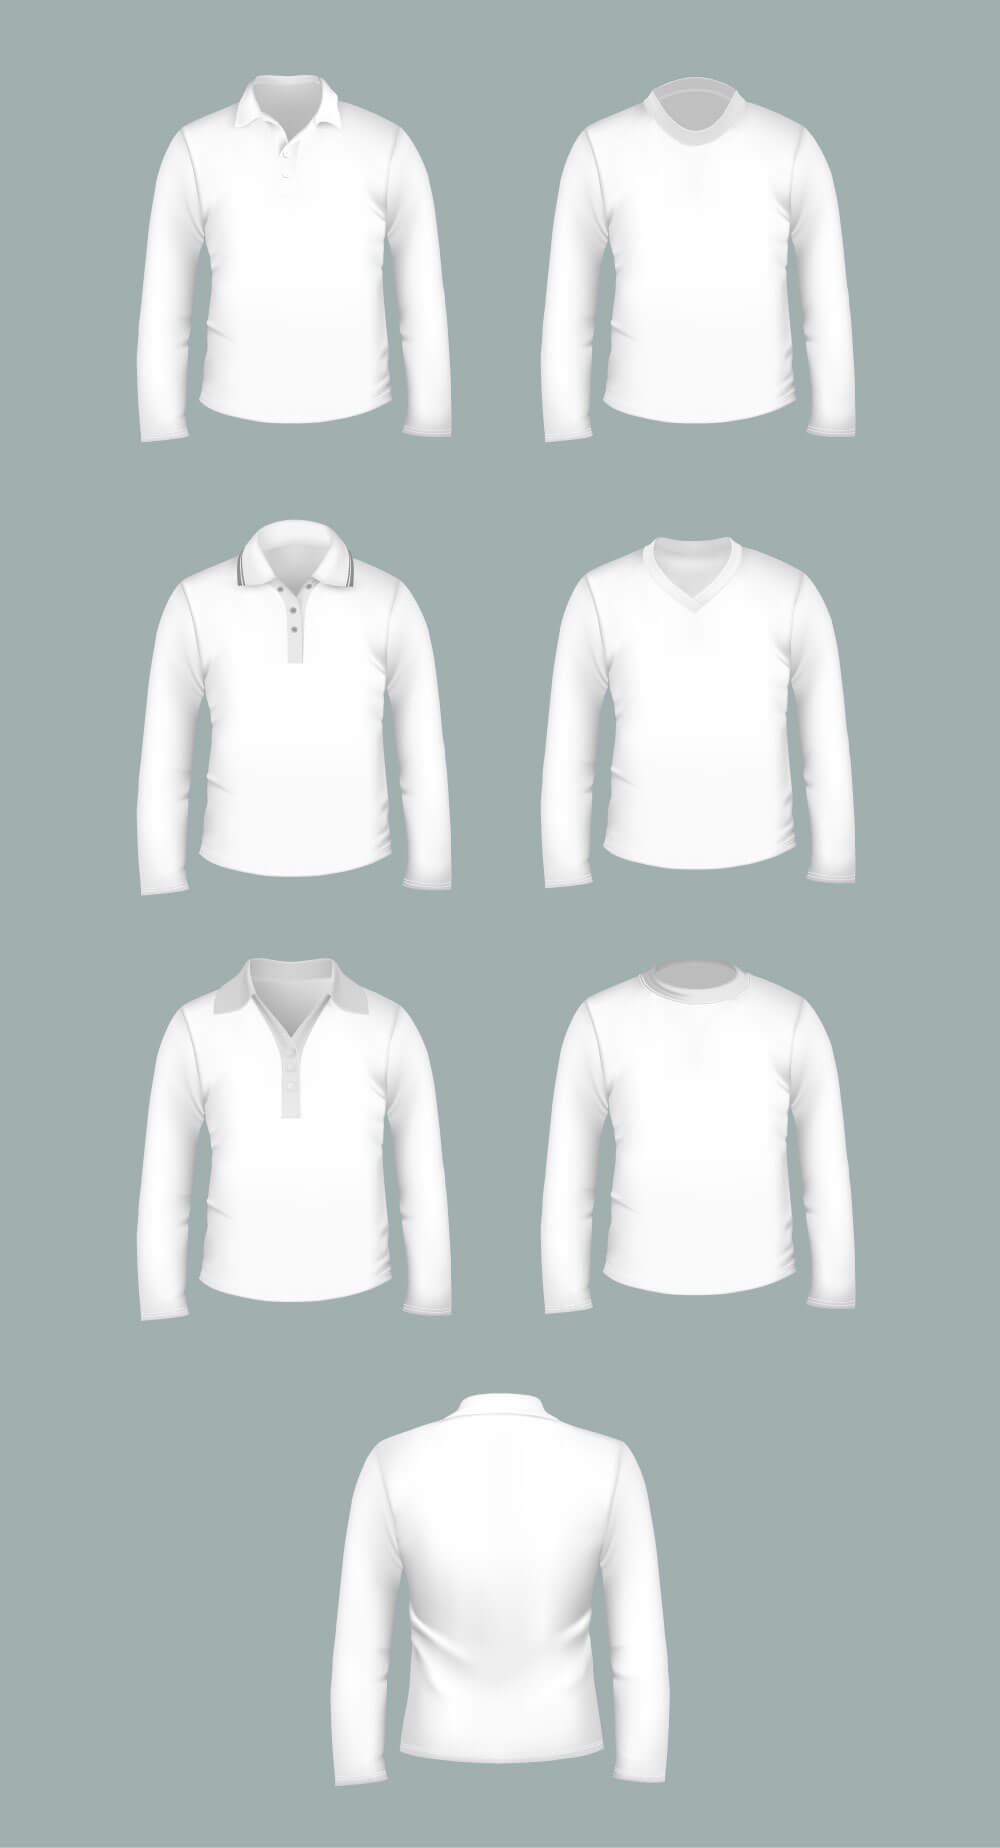 Free T-Shirt Mockup PSD Templates Pack (1)22 (1)